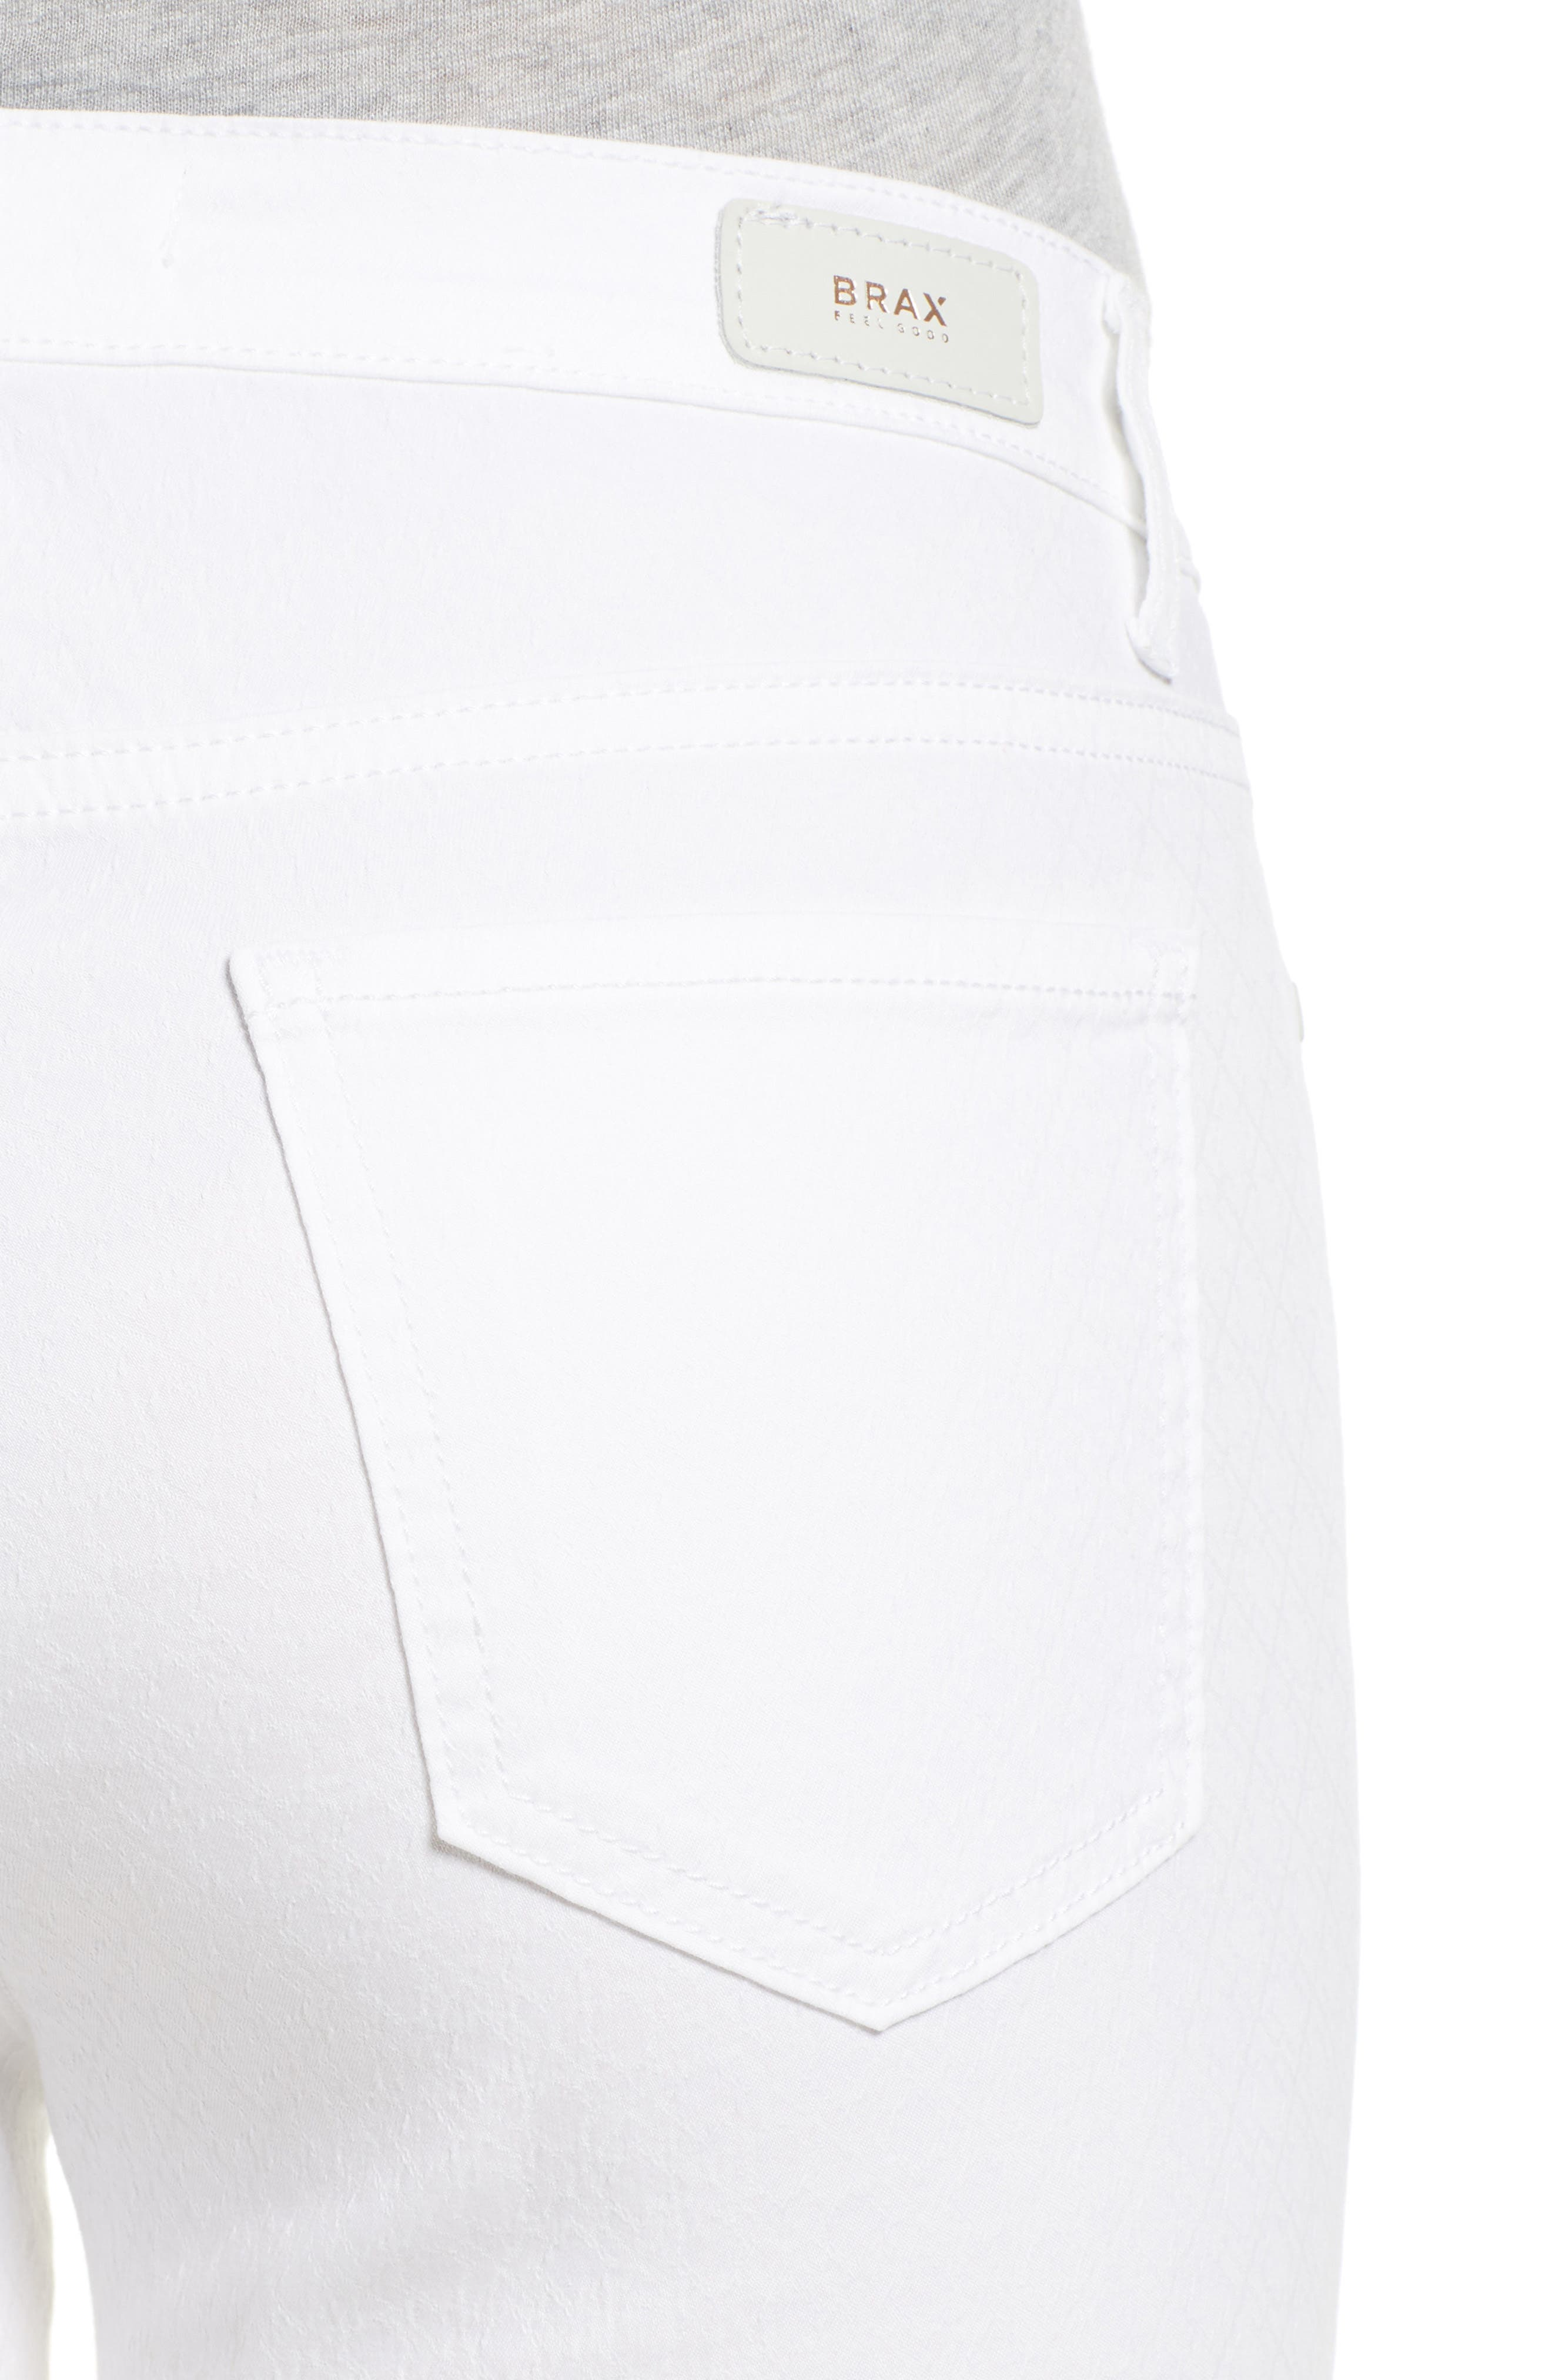 Shakira White Jeans,                             Alternate thumbnail 4, color,                             White